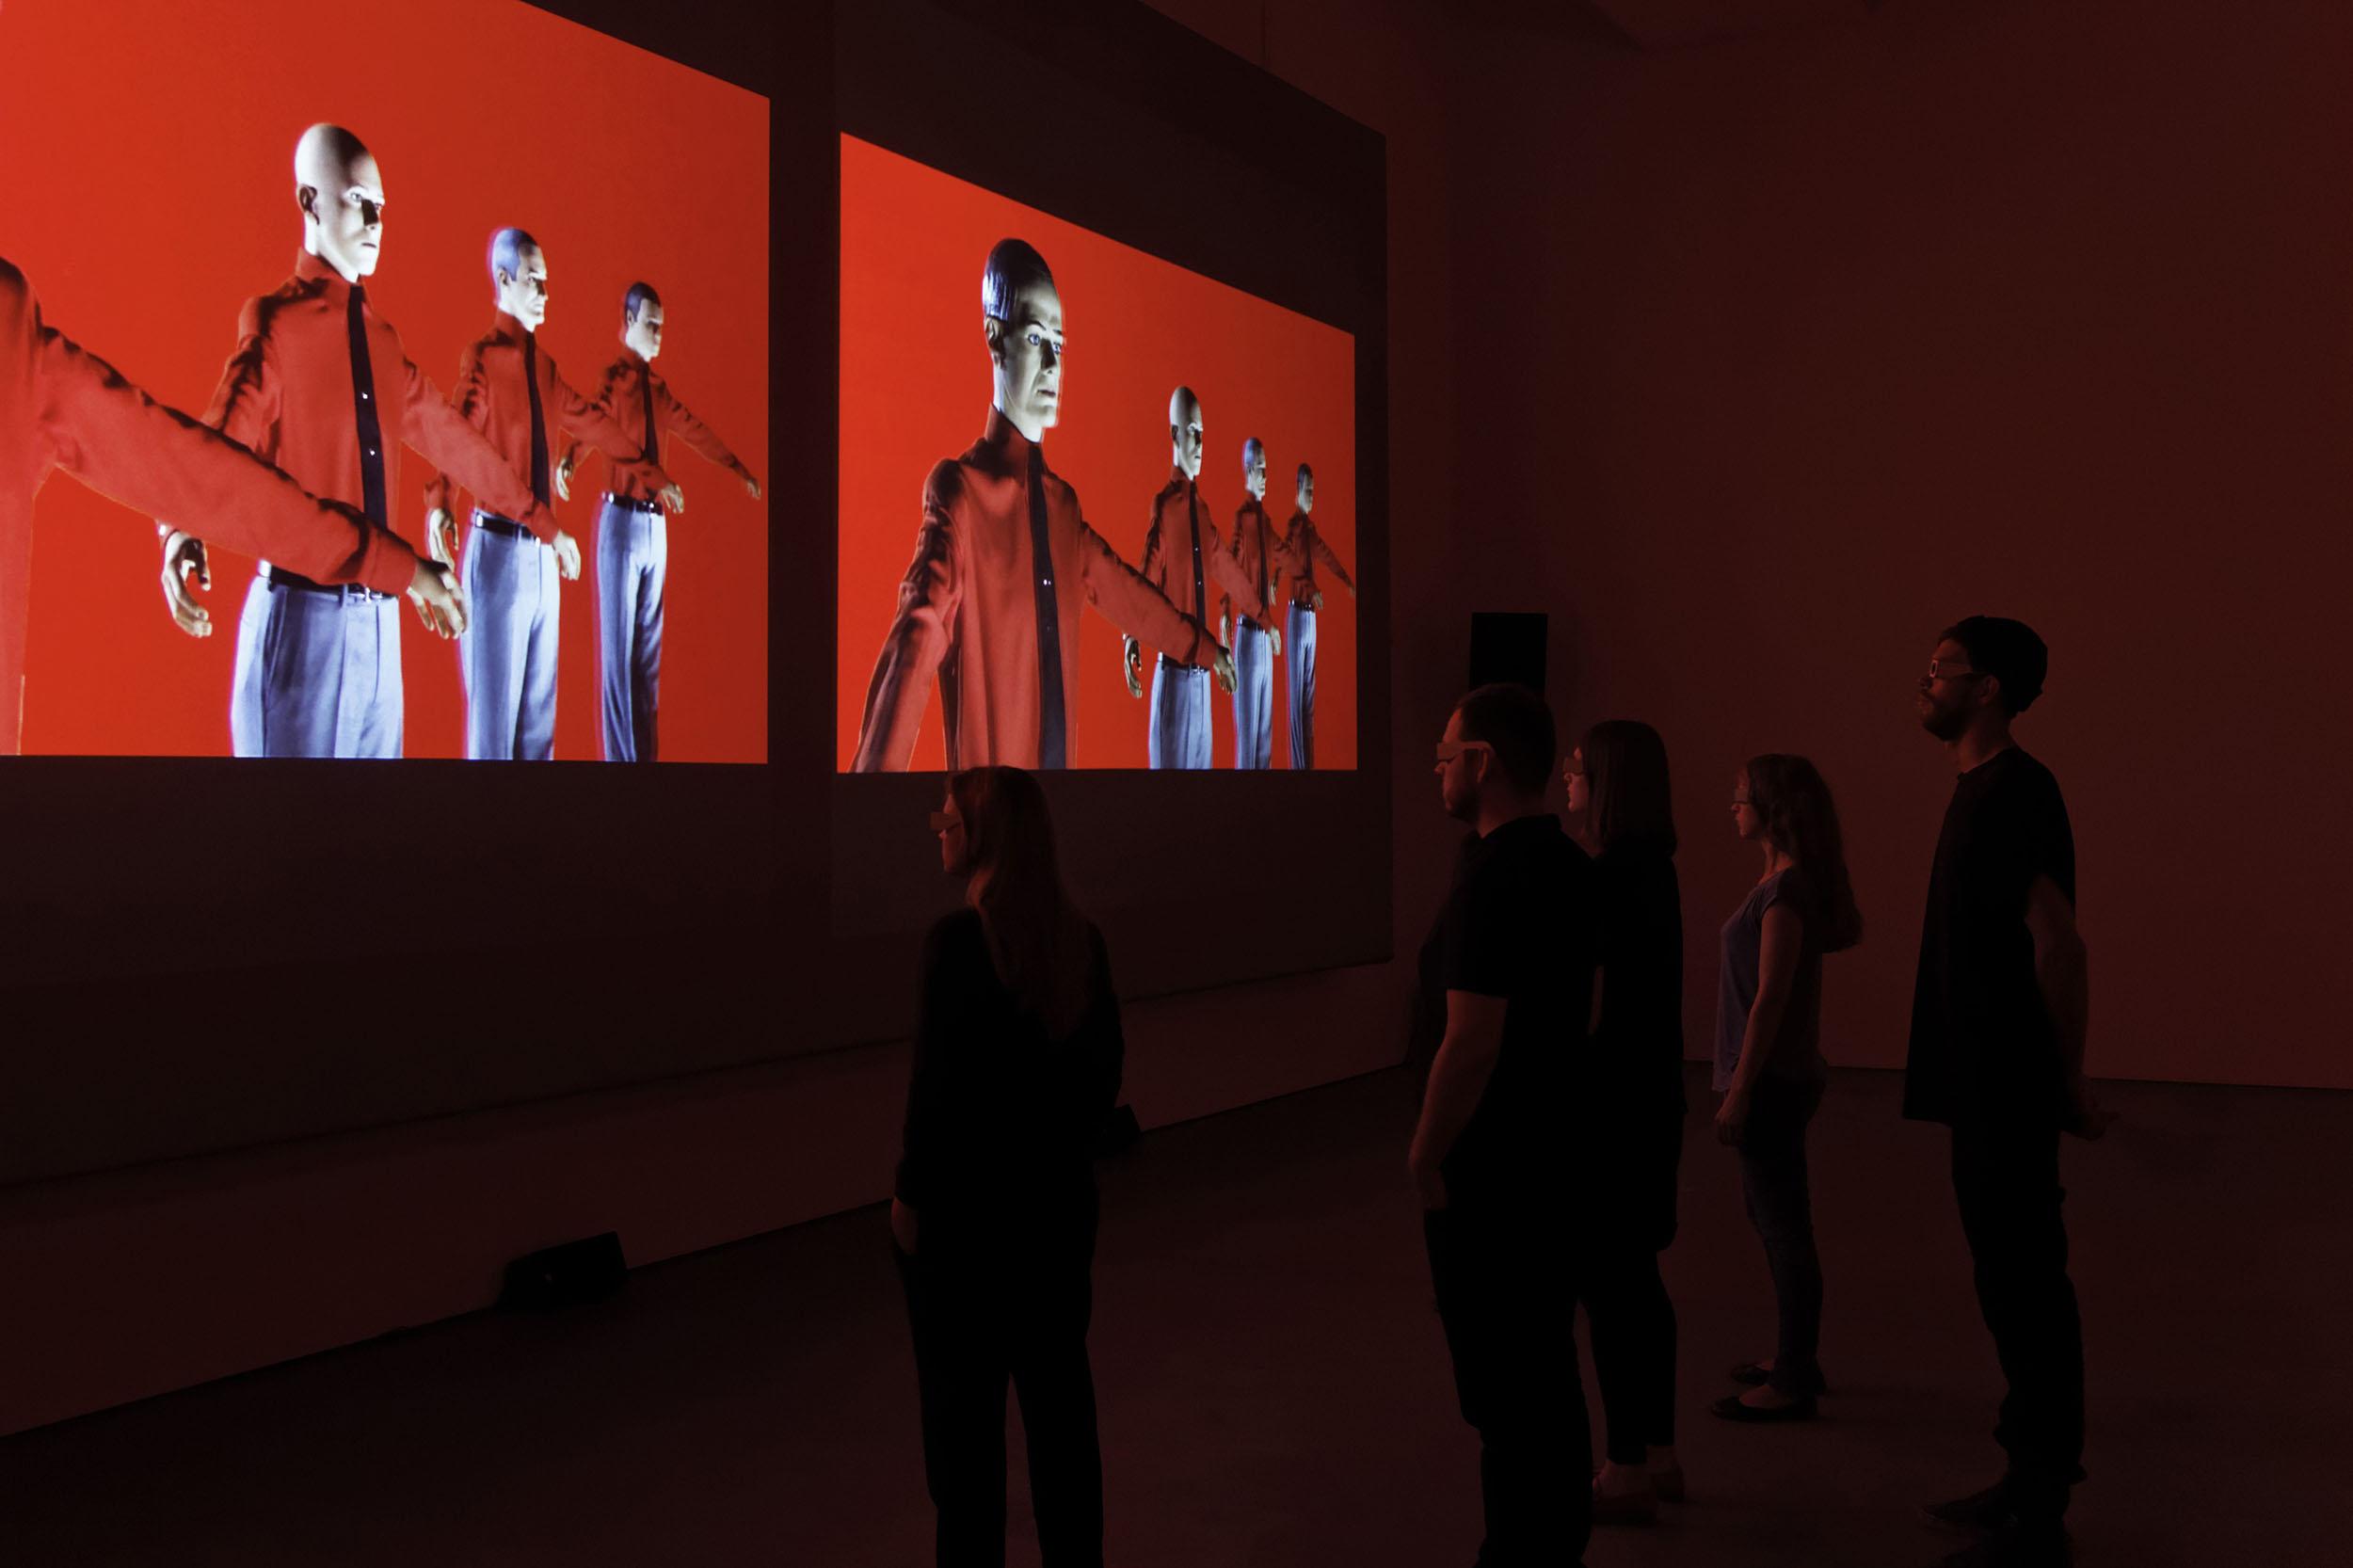 Kraftwerk. 3-D Video-Installation 12345678 - Sprüth Magers Berlin, 2013